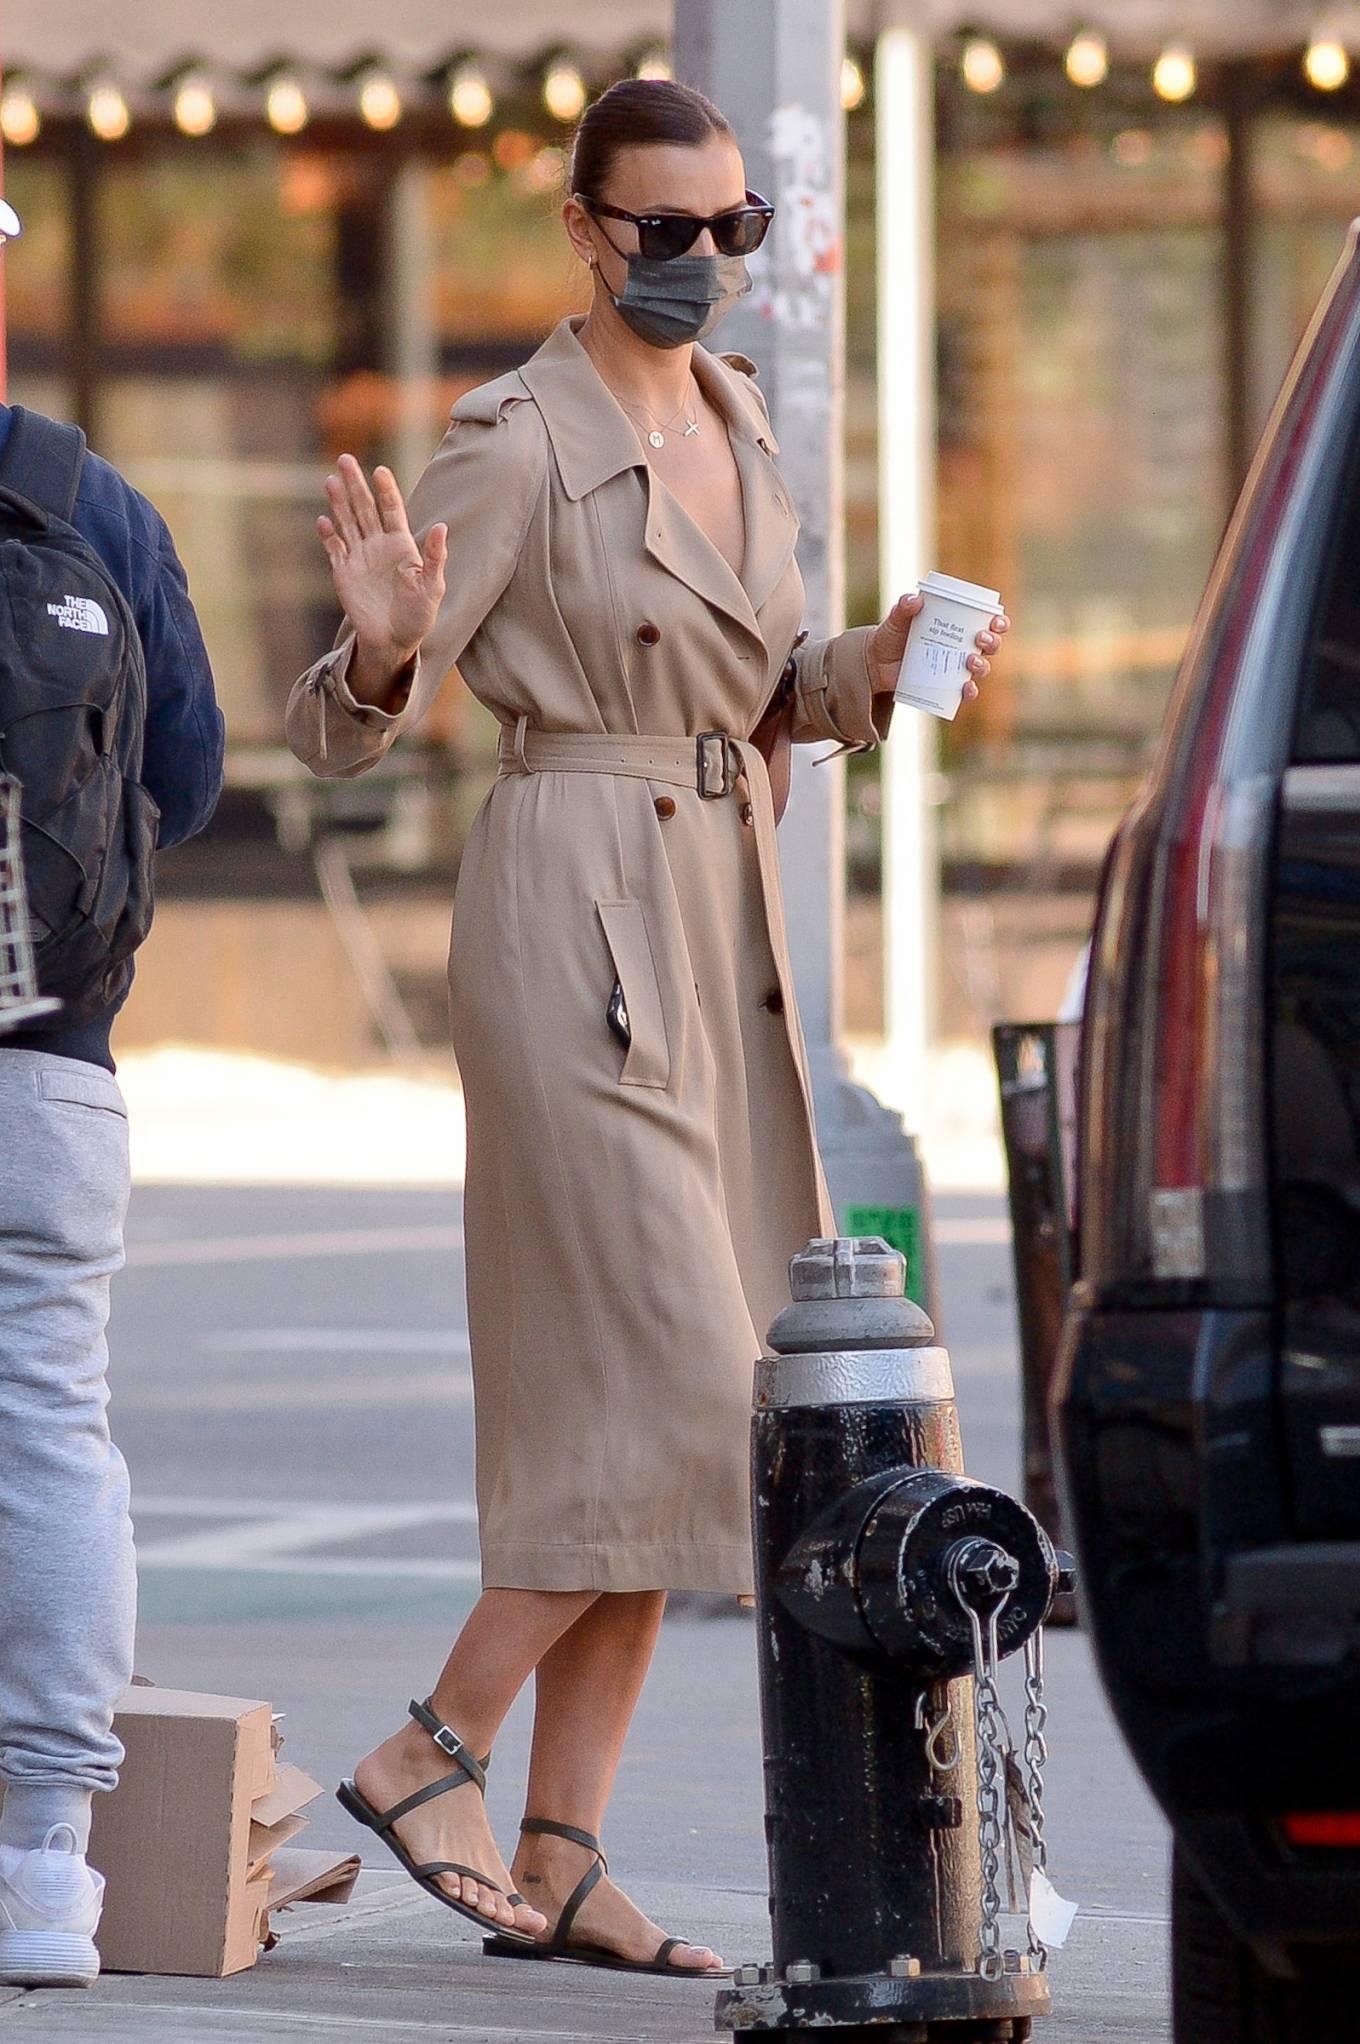 Irina Shayk - Wearing a camel trench coat in New York